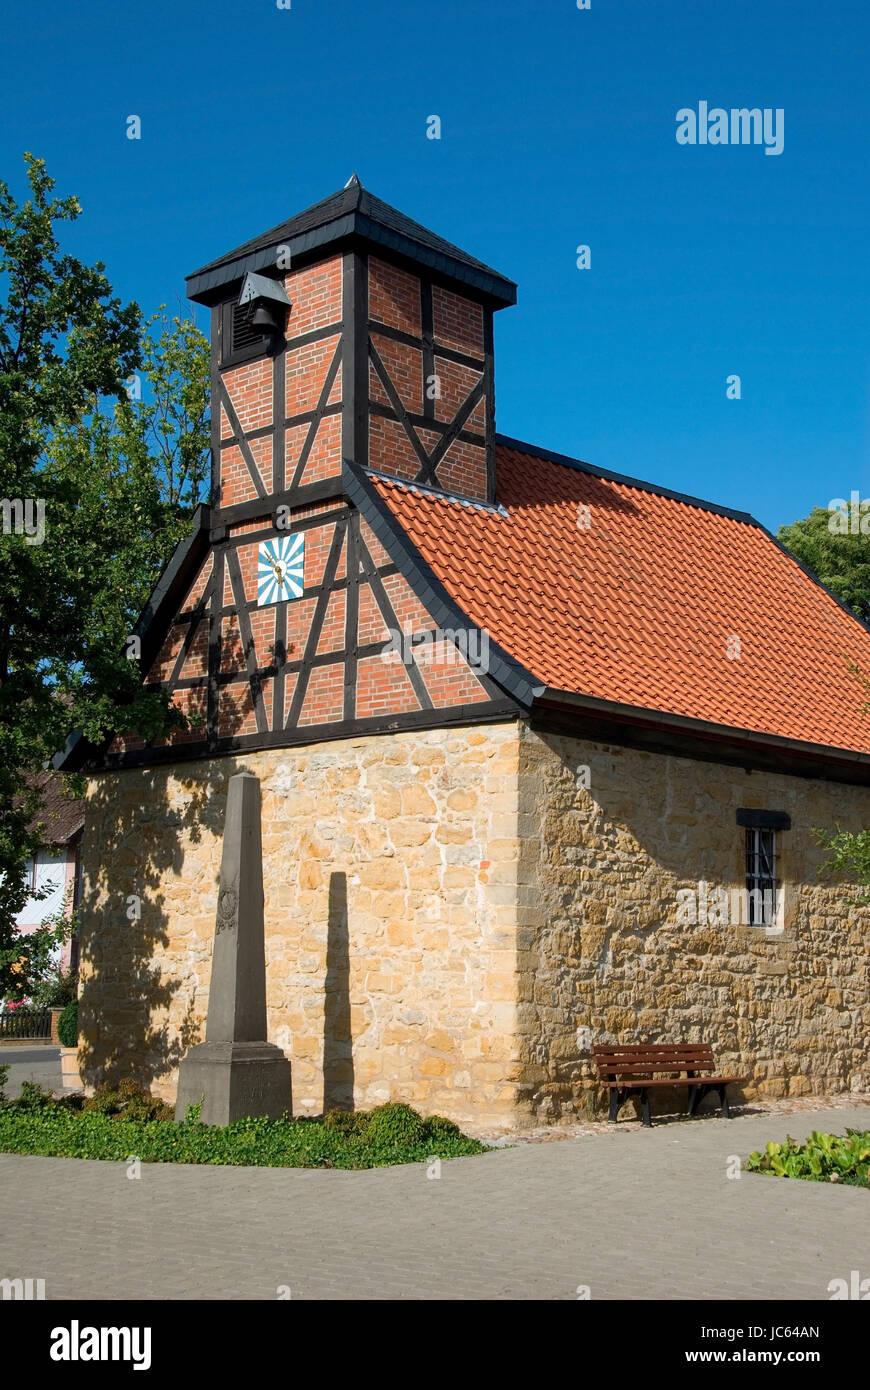 Deutschland, Niedersachsen, Ilsede, Buelten, alte Kapelle, 15. Jahrhundert, Deutschland, Niedersachsen, Alte Kapelle, Stockbild